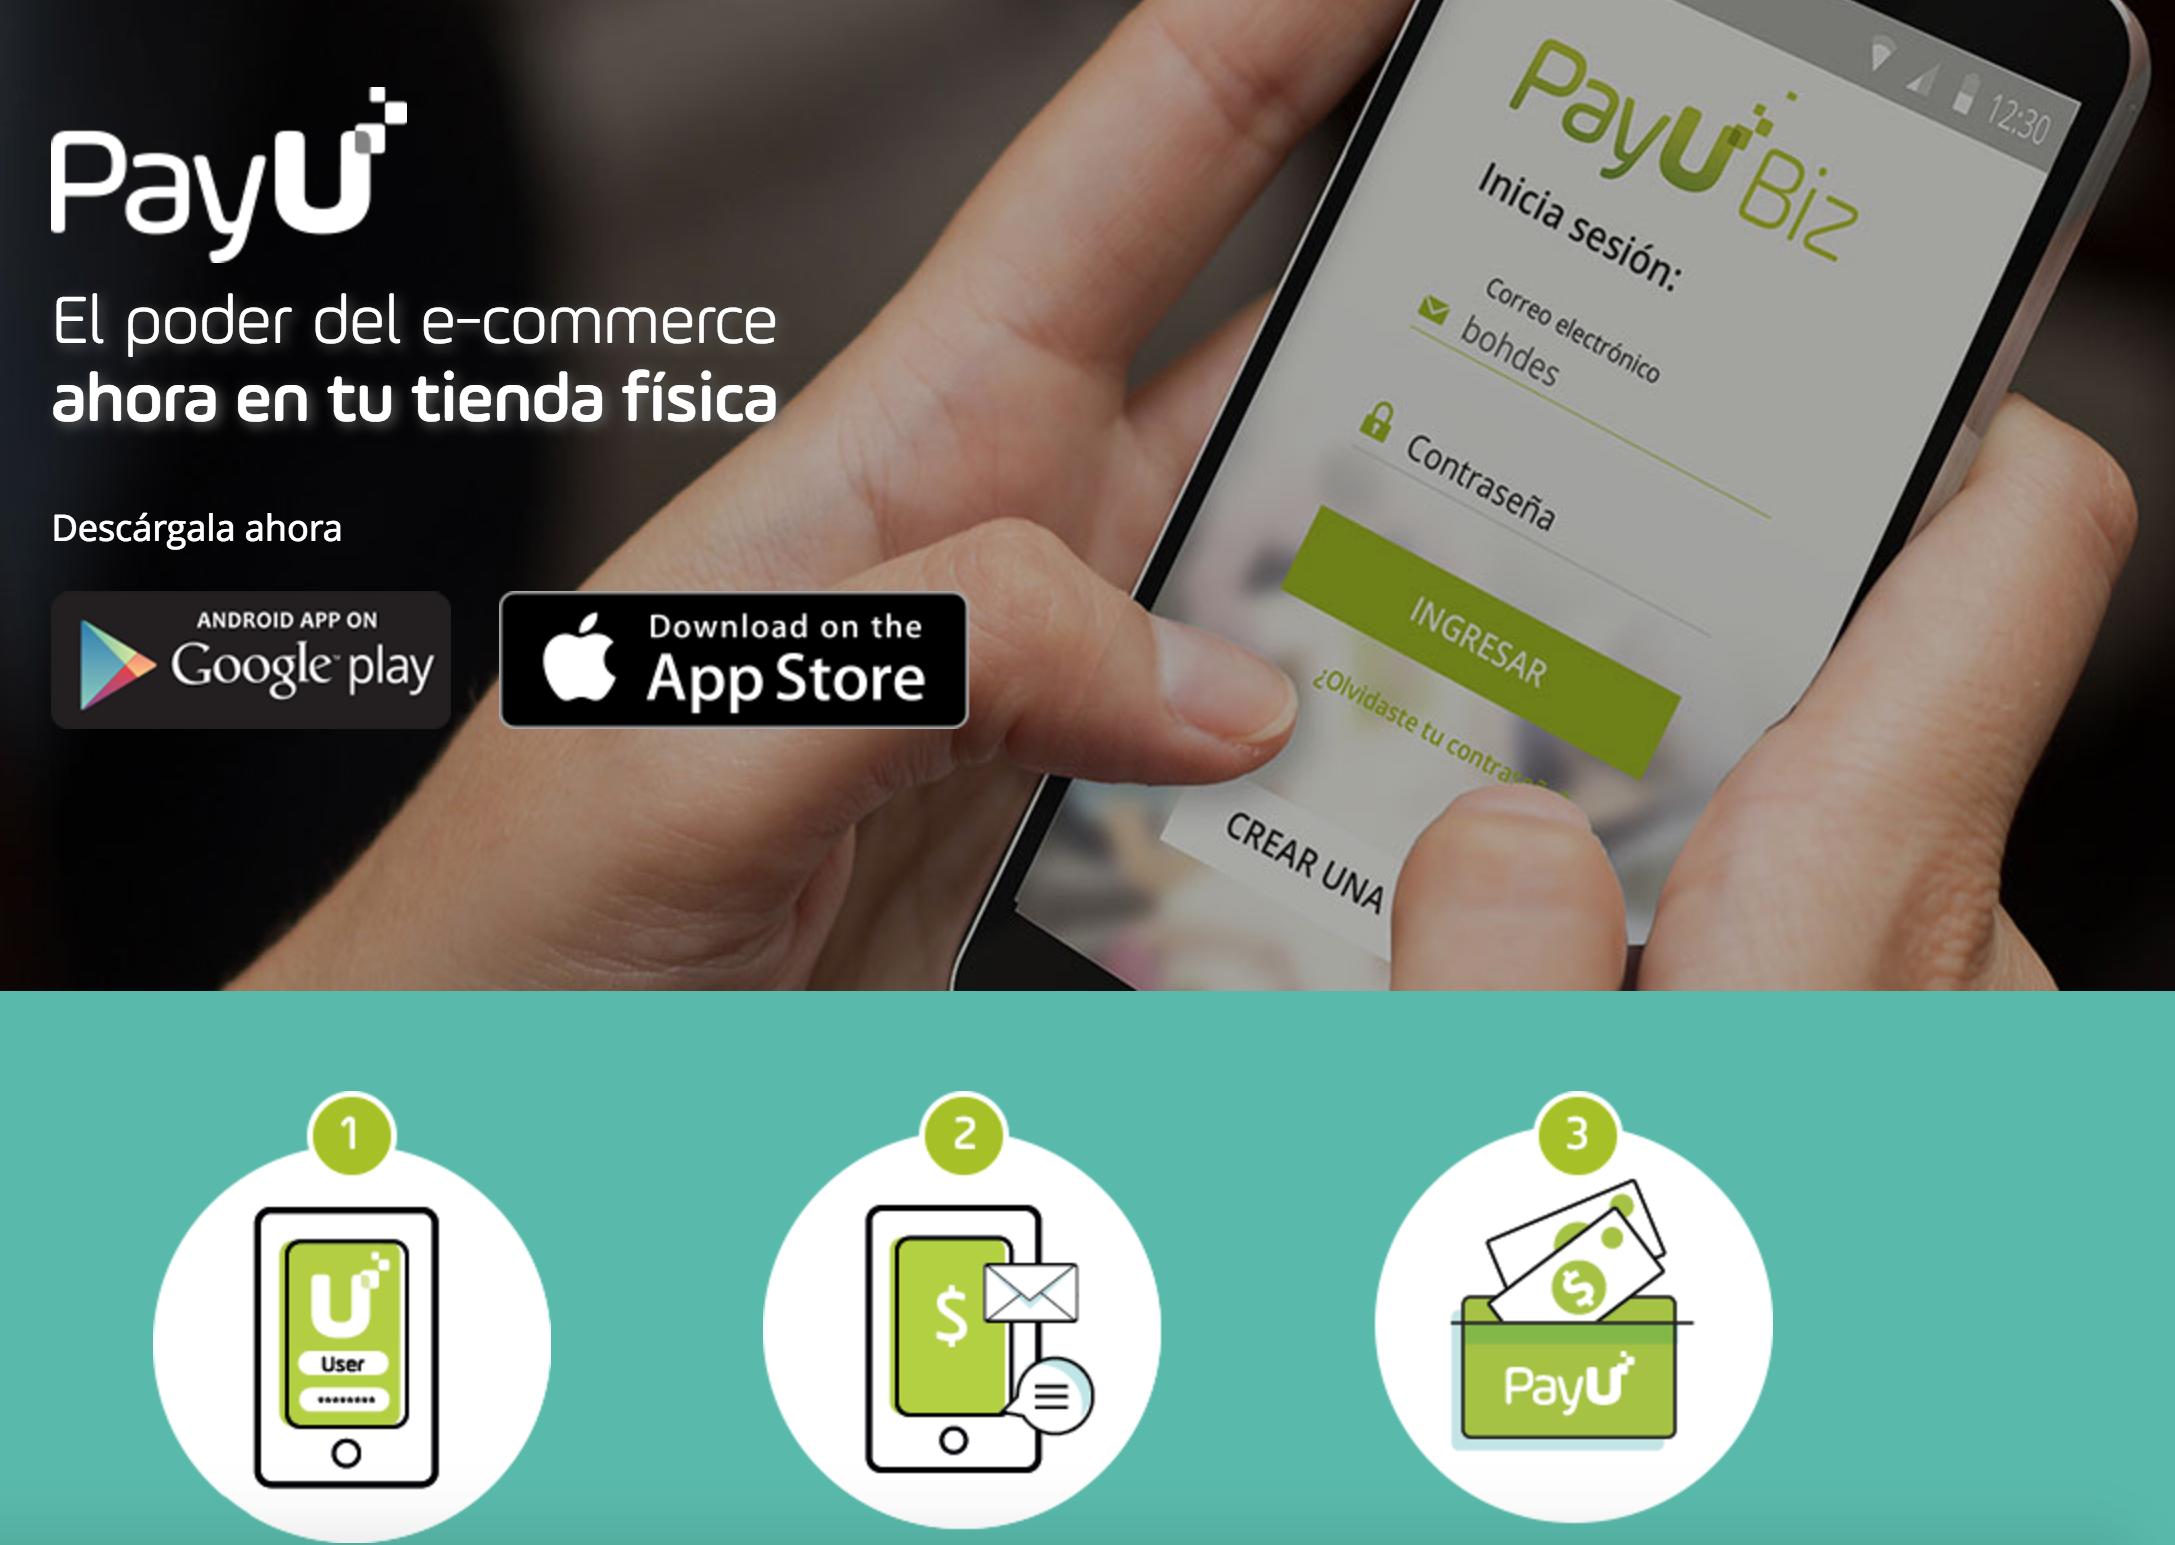 PayU Biz for iOS   Role: iOS Programmer